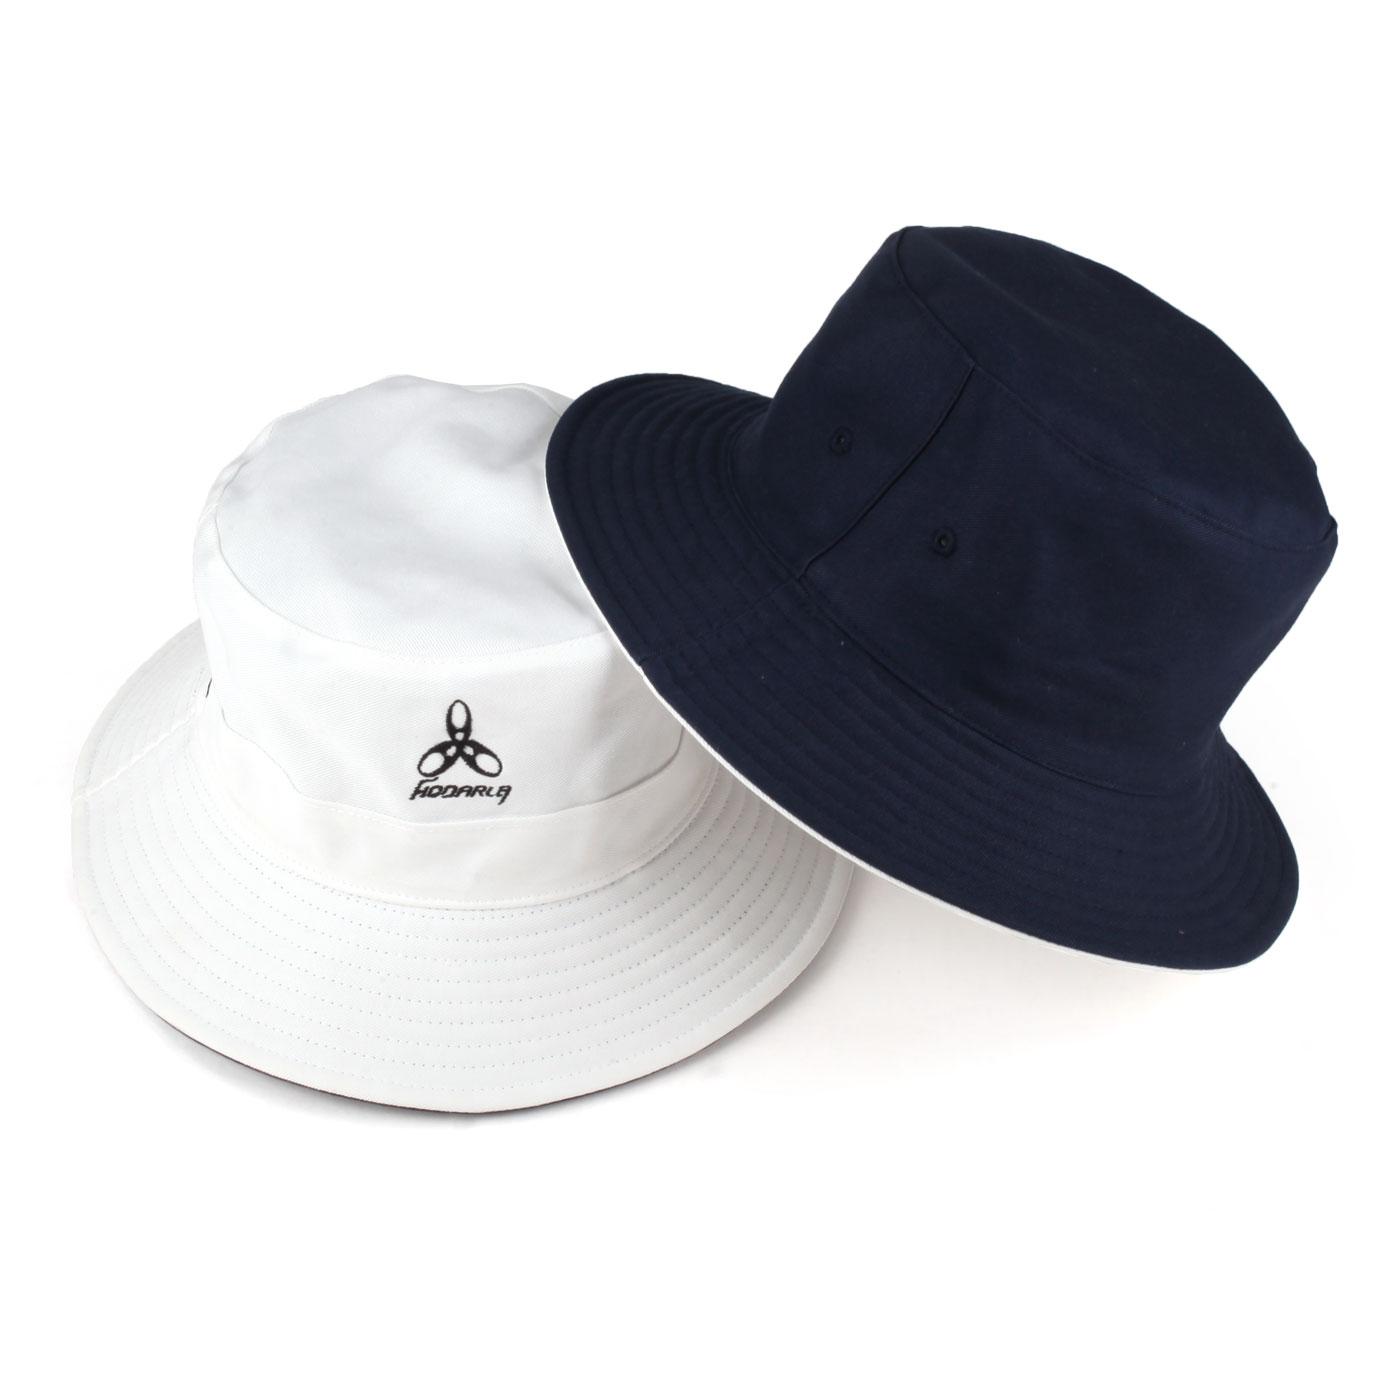 HODARLA 雙面漁夫帽 3304701 - 白丈青